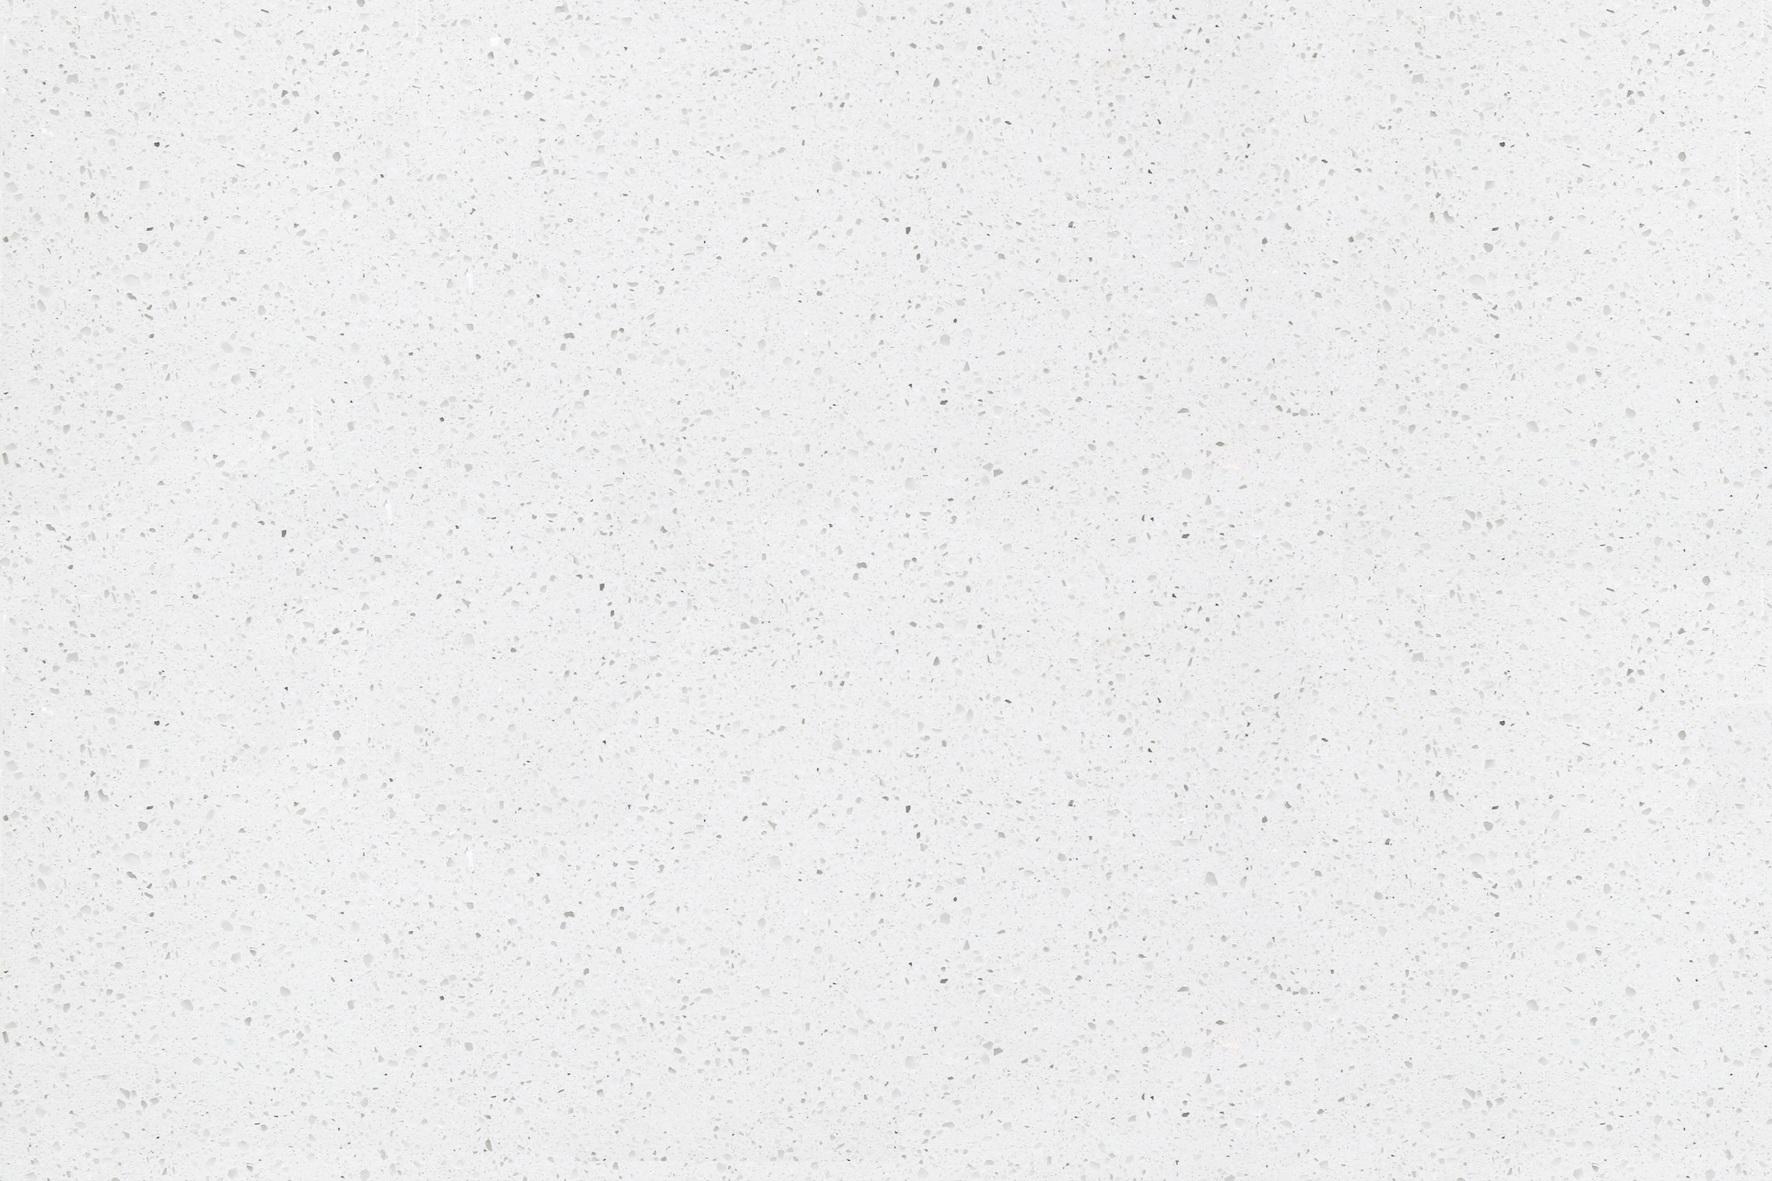 RAINBOW WHITE UNIPLUS UNIPLUS LUCIDE Foto: 1_44971_37637.jpg